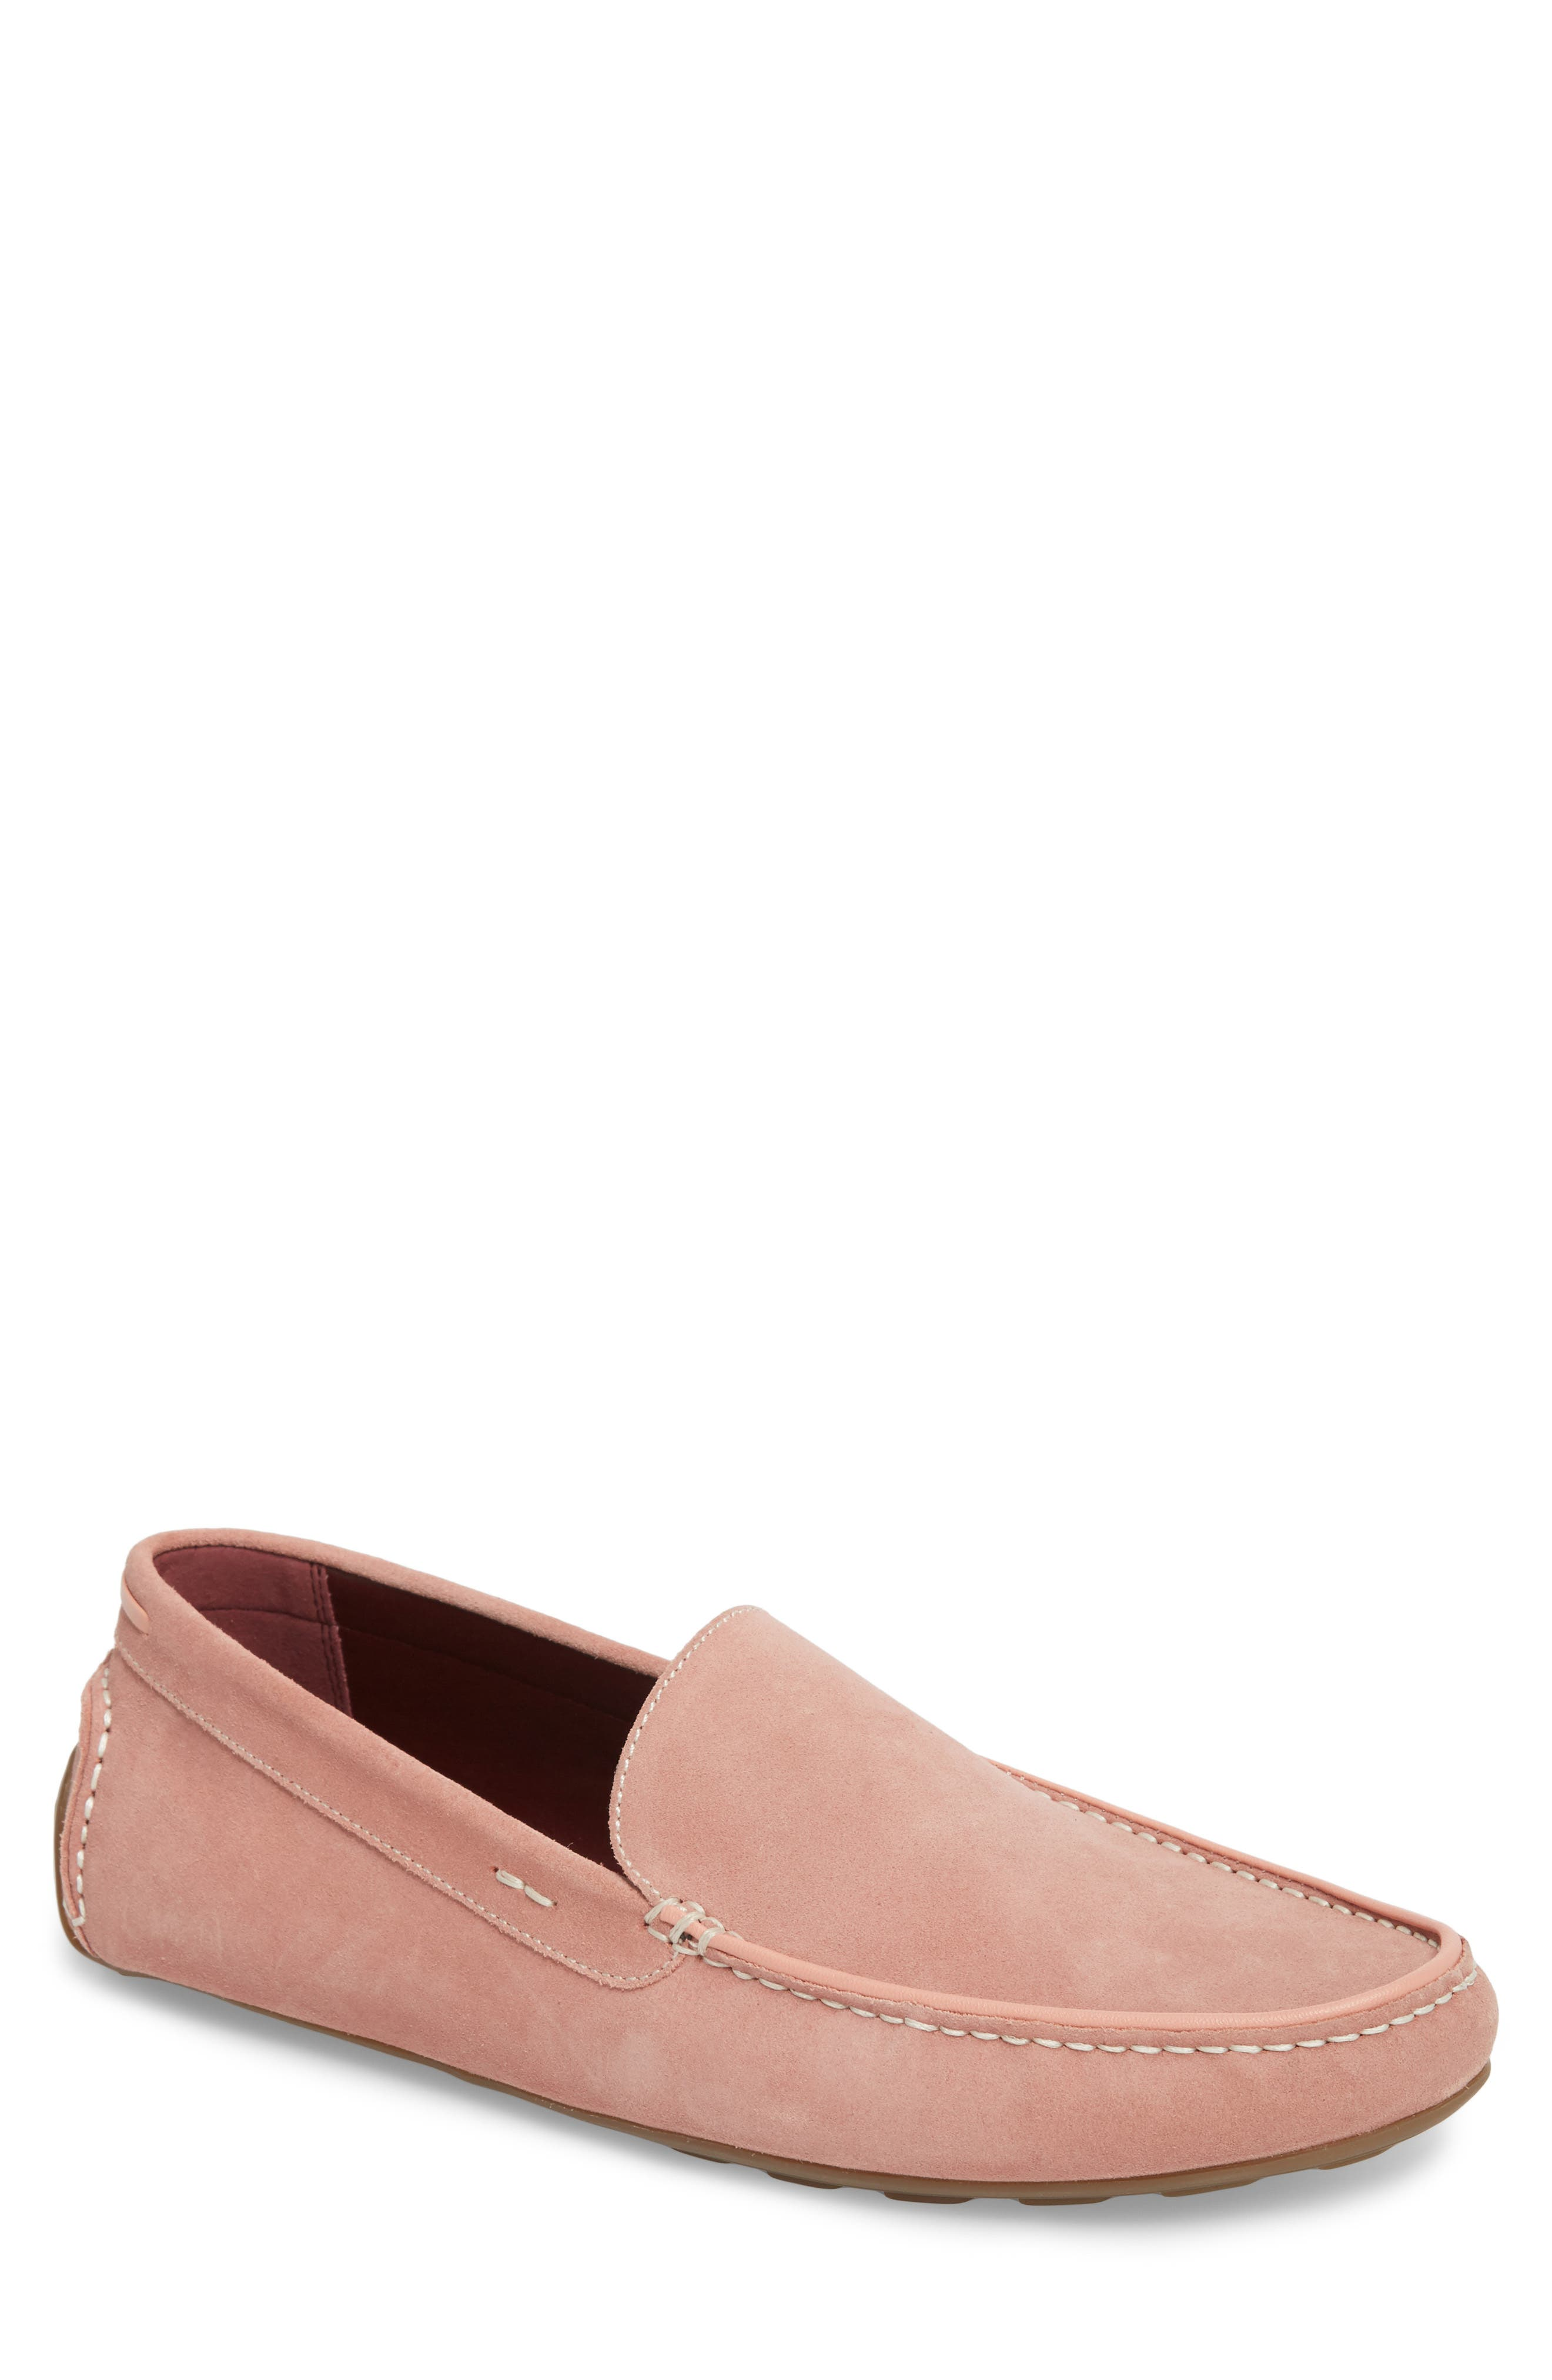 Leroy Driver Shoe,                             Main thumbnail 1, color,                             Blush